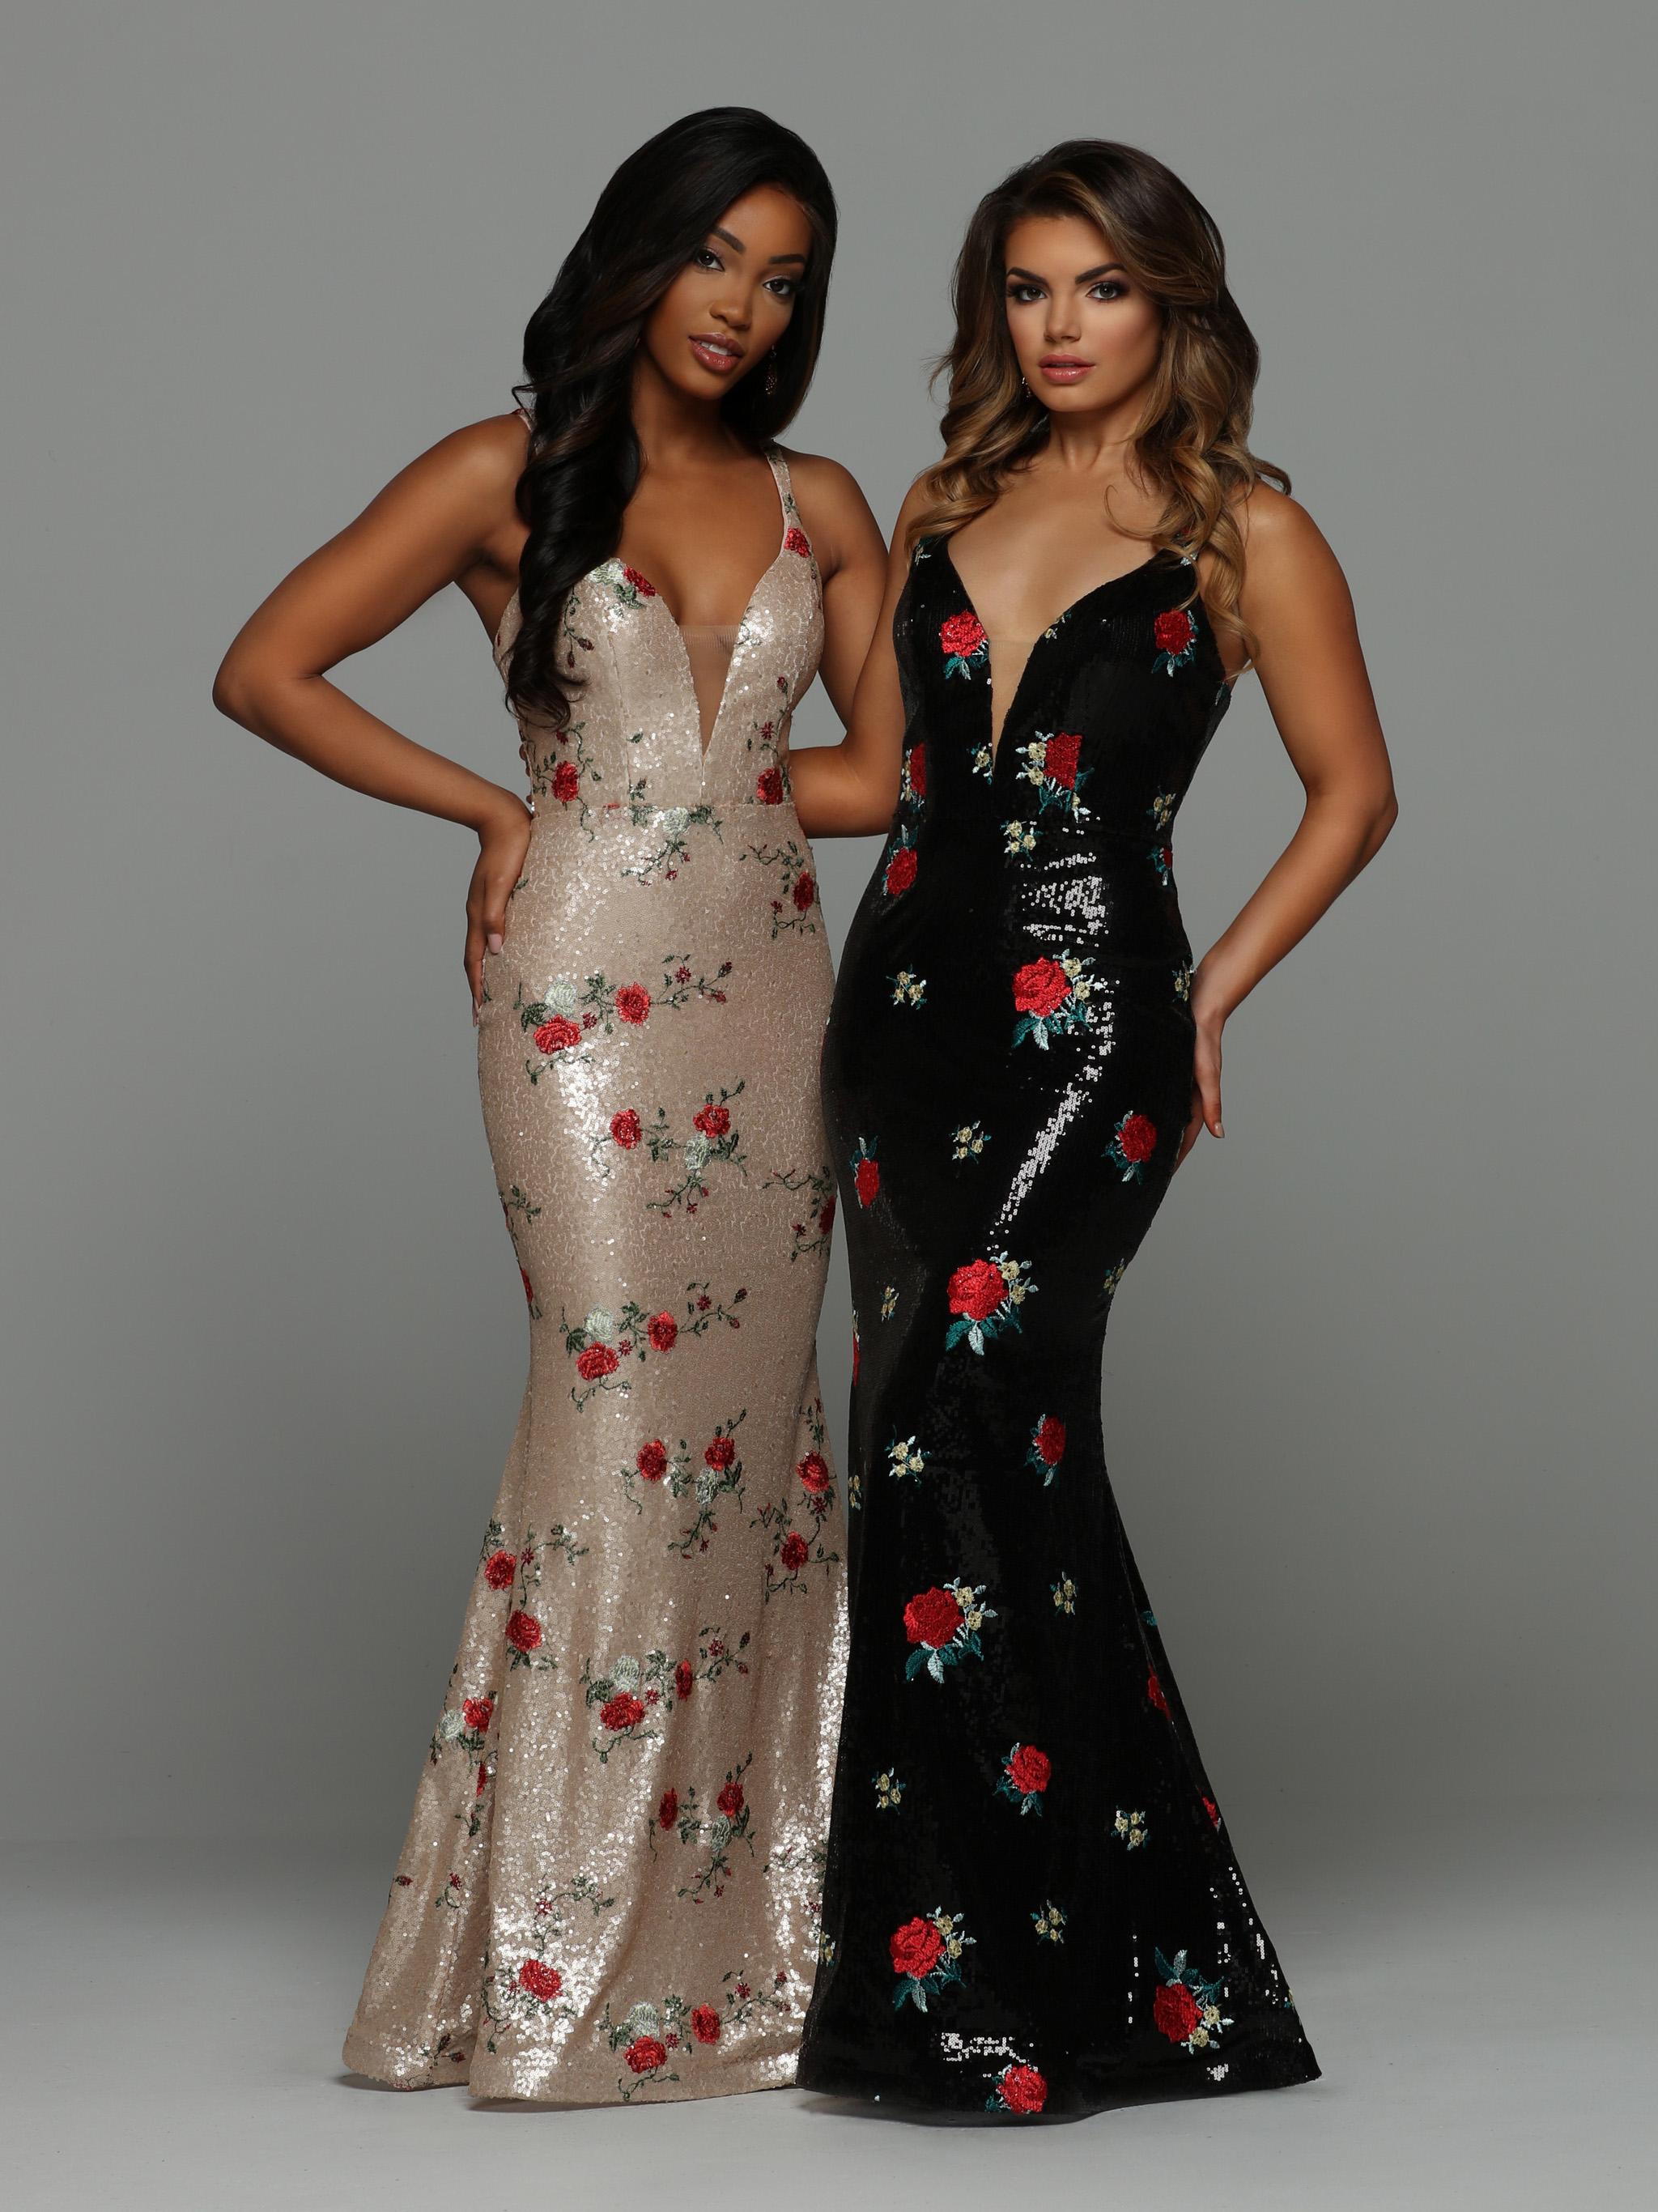 Top Prom Dress Trends 2019 Floral Prom Dresses Sparkle